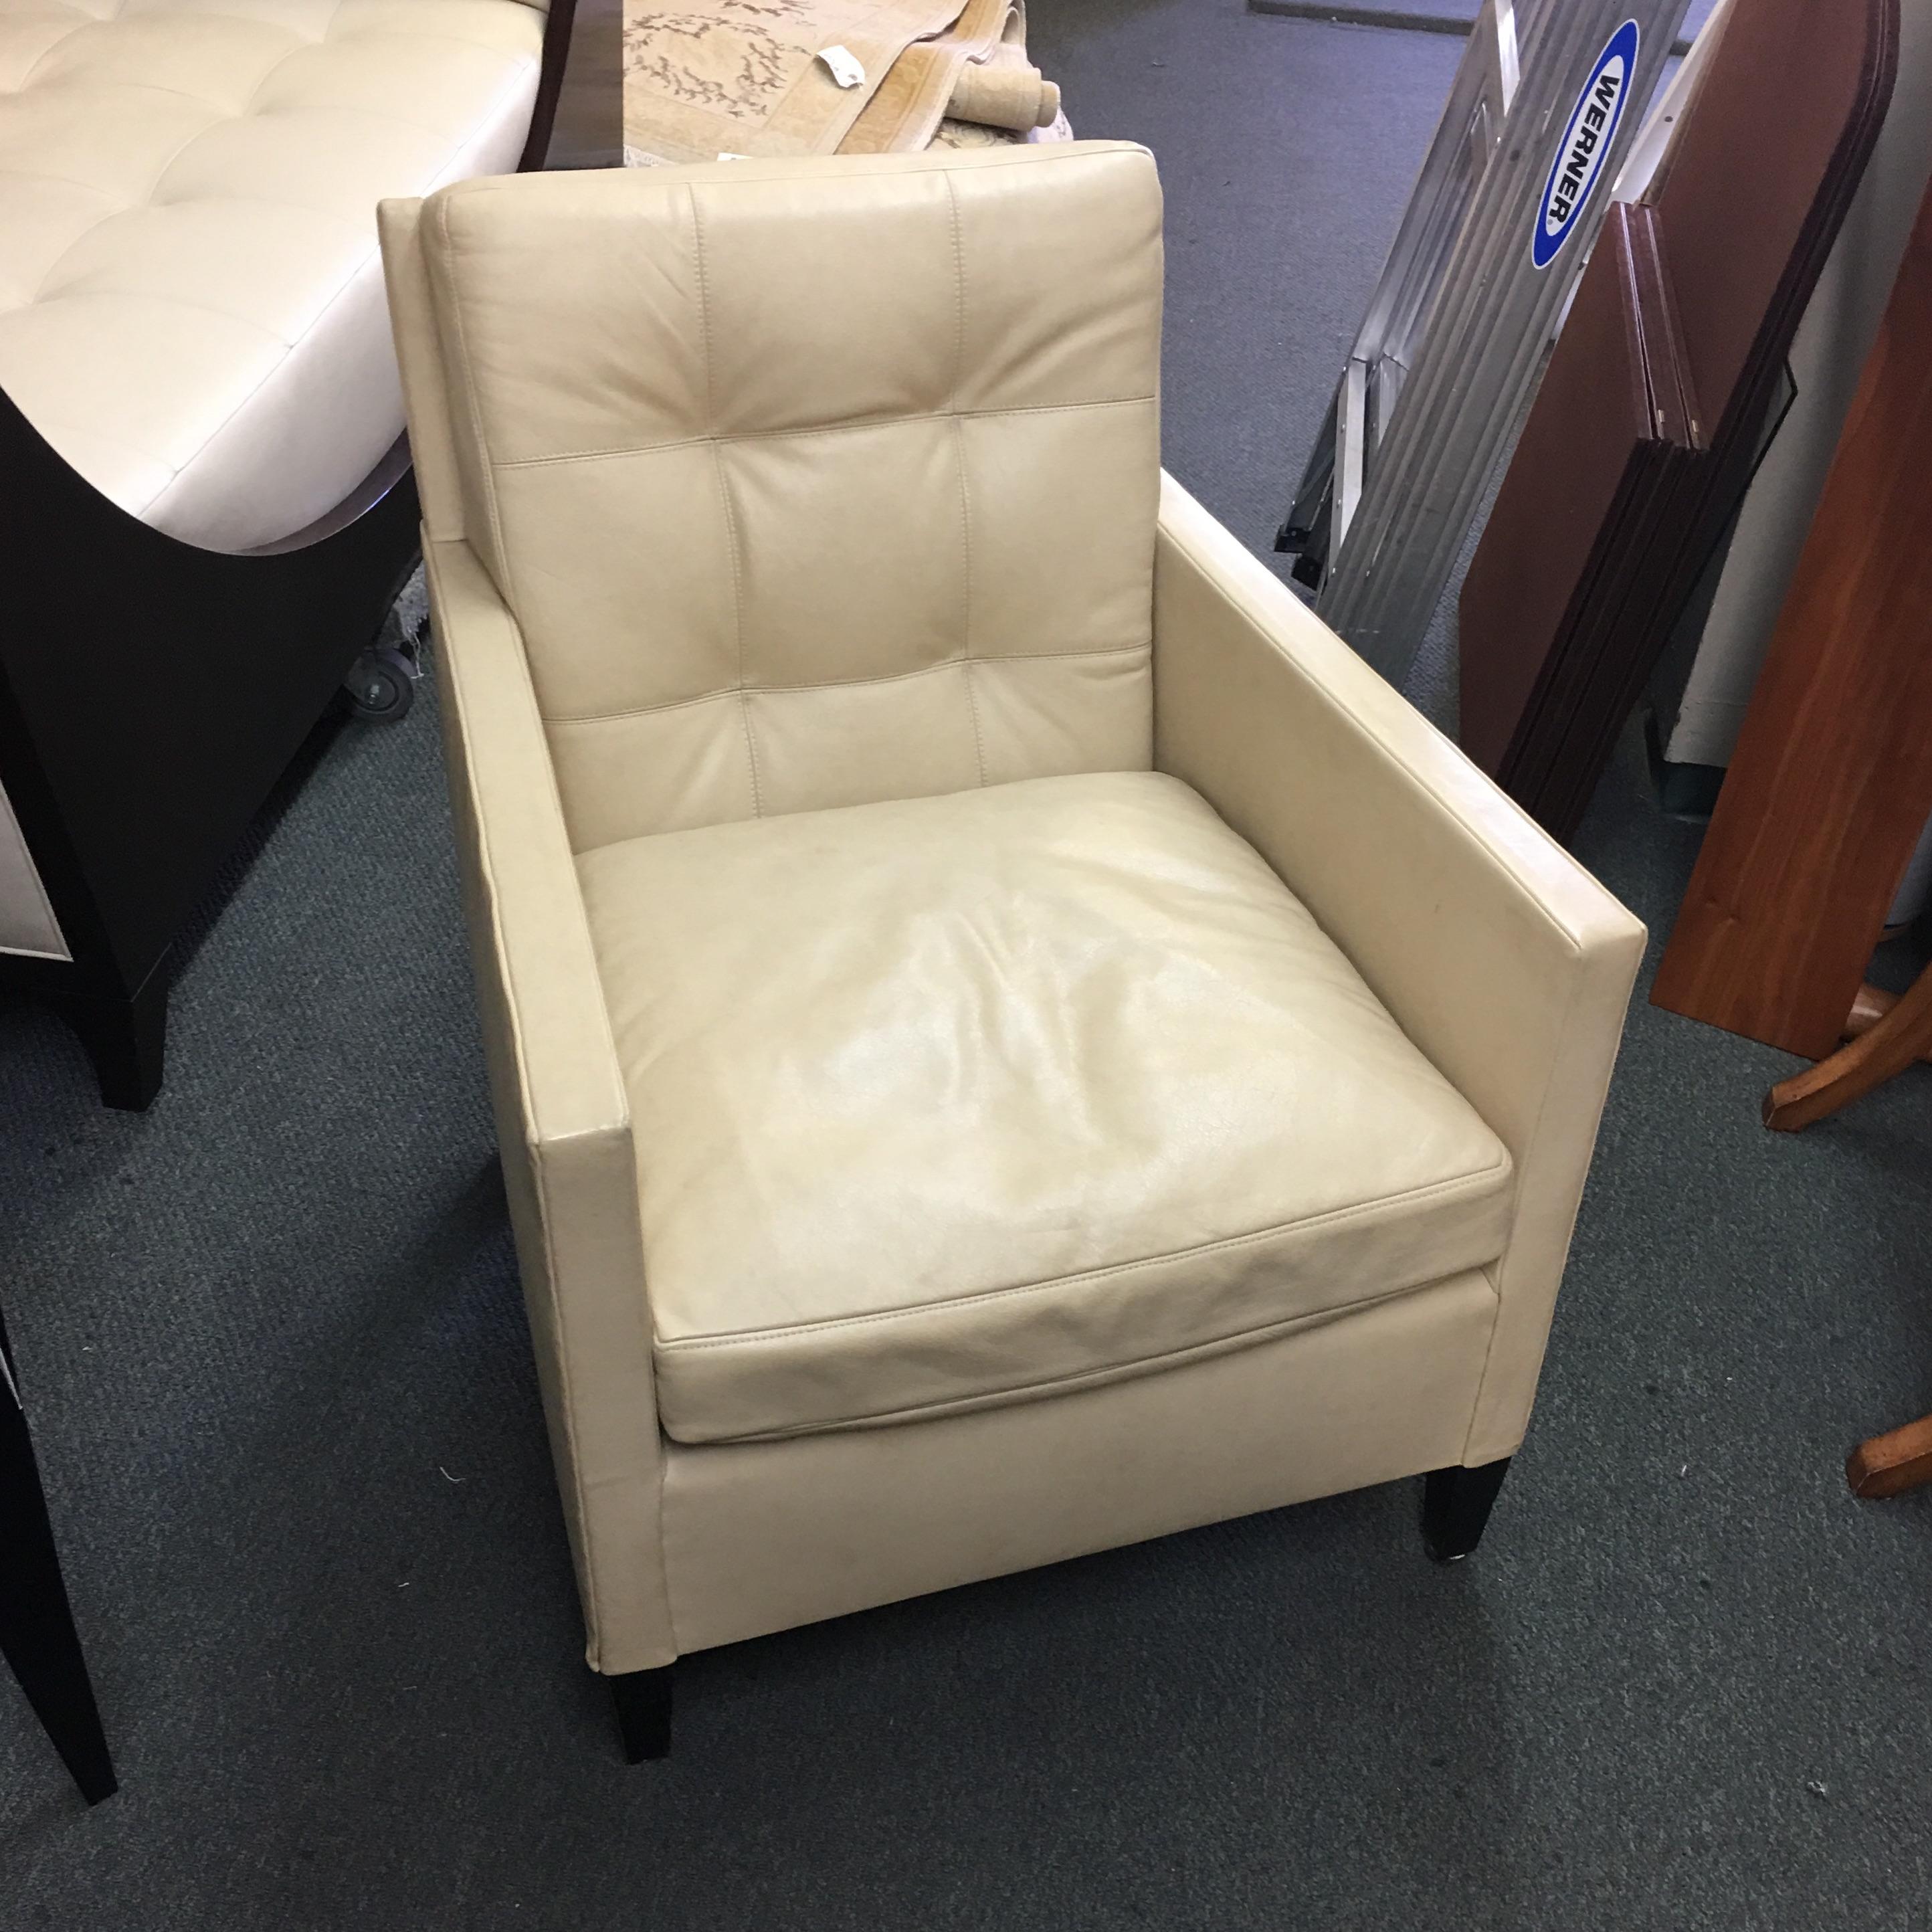 gerards furniture. image of gerard furniture bentley leather arm chair gerards